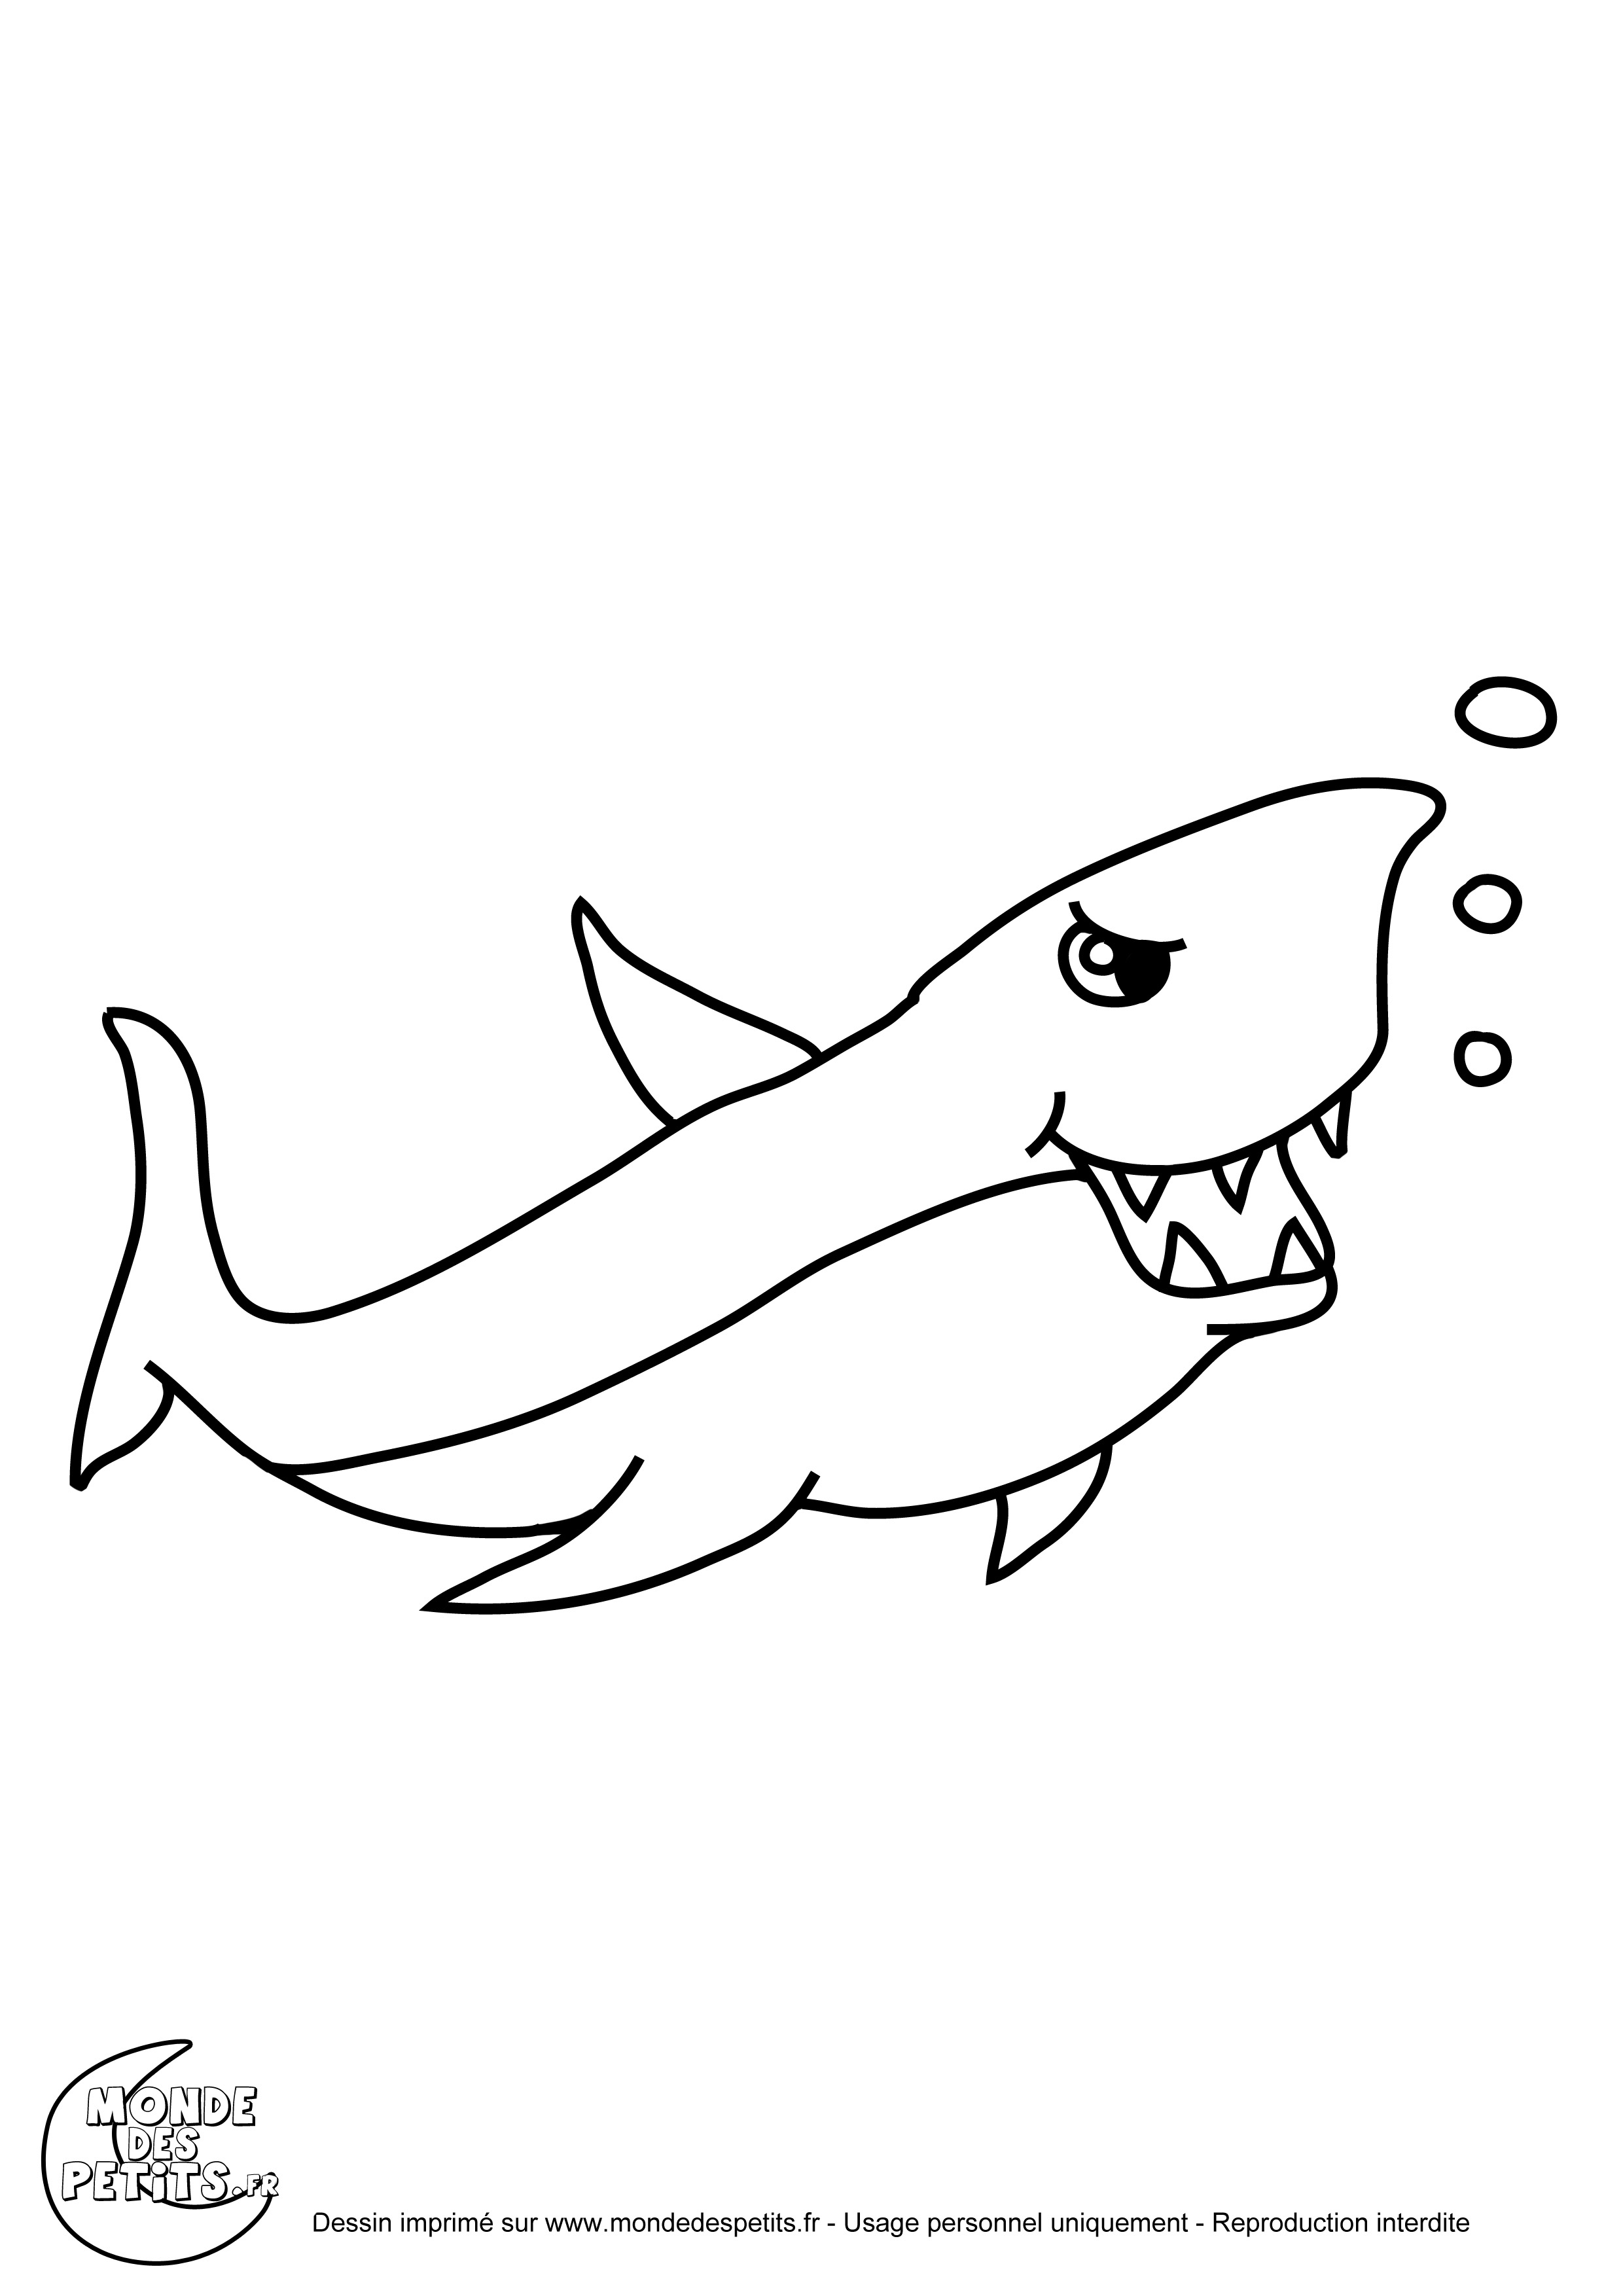 Monde des petits coloriages imprimer - Requin dessin ...